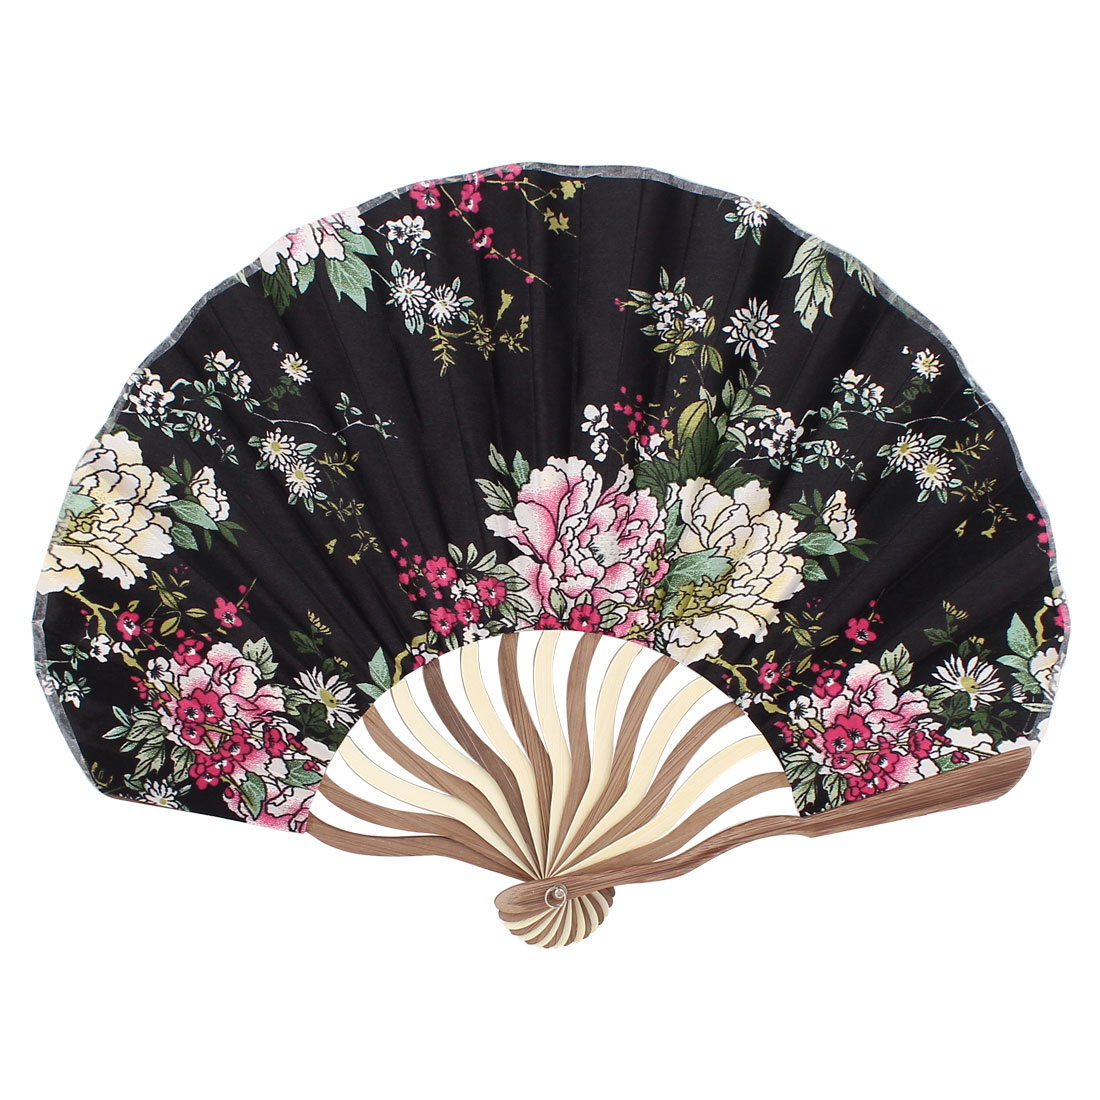 Bent Bamboo Handle Flower Print Silk Blend Section Foldable Craft Hand Fan Black